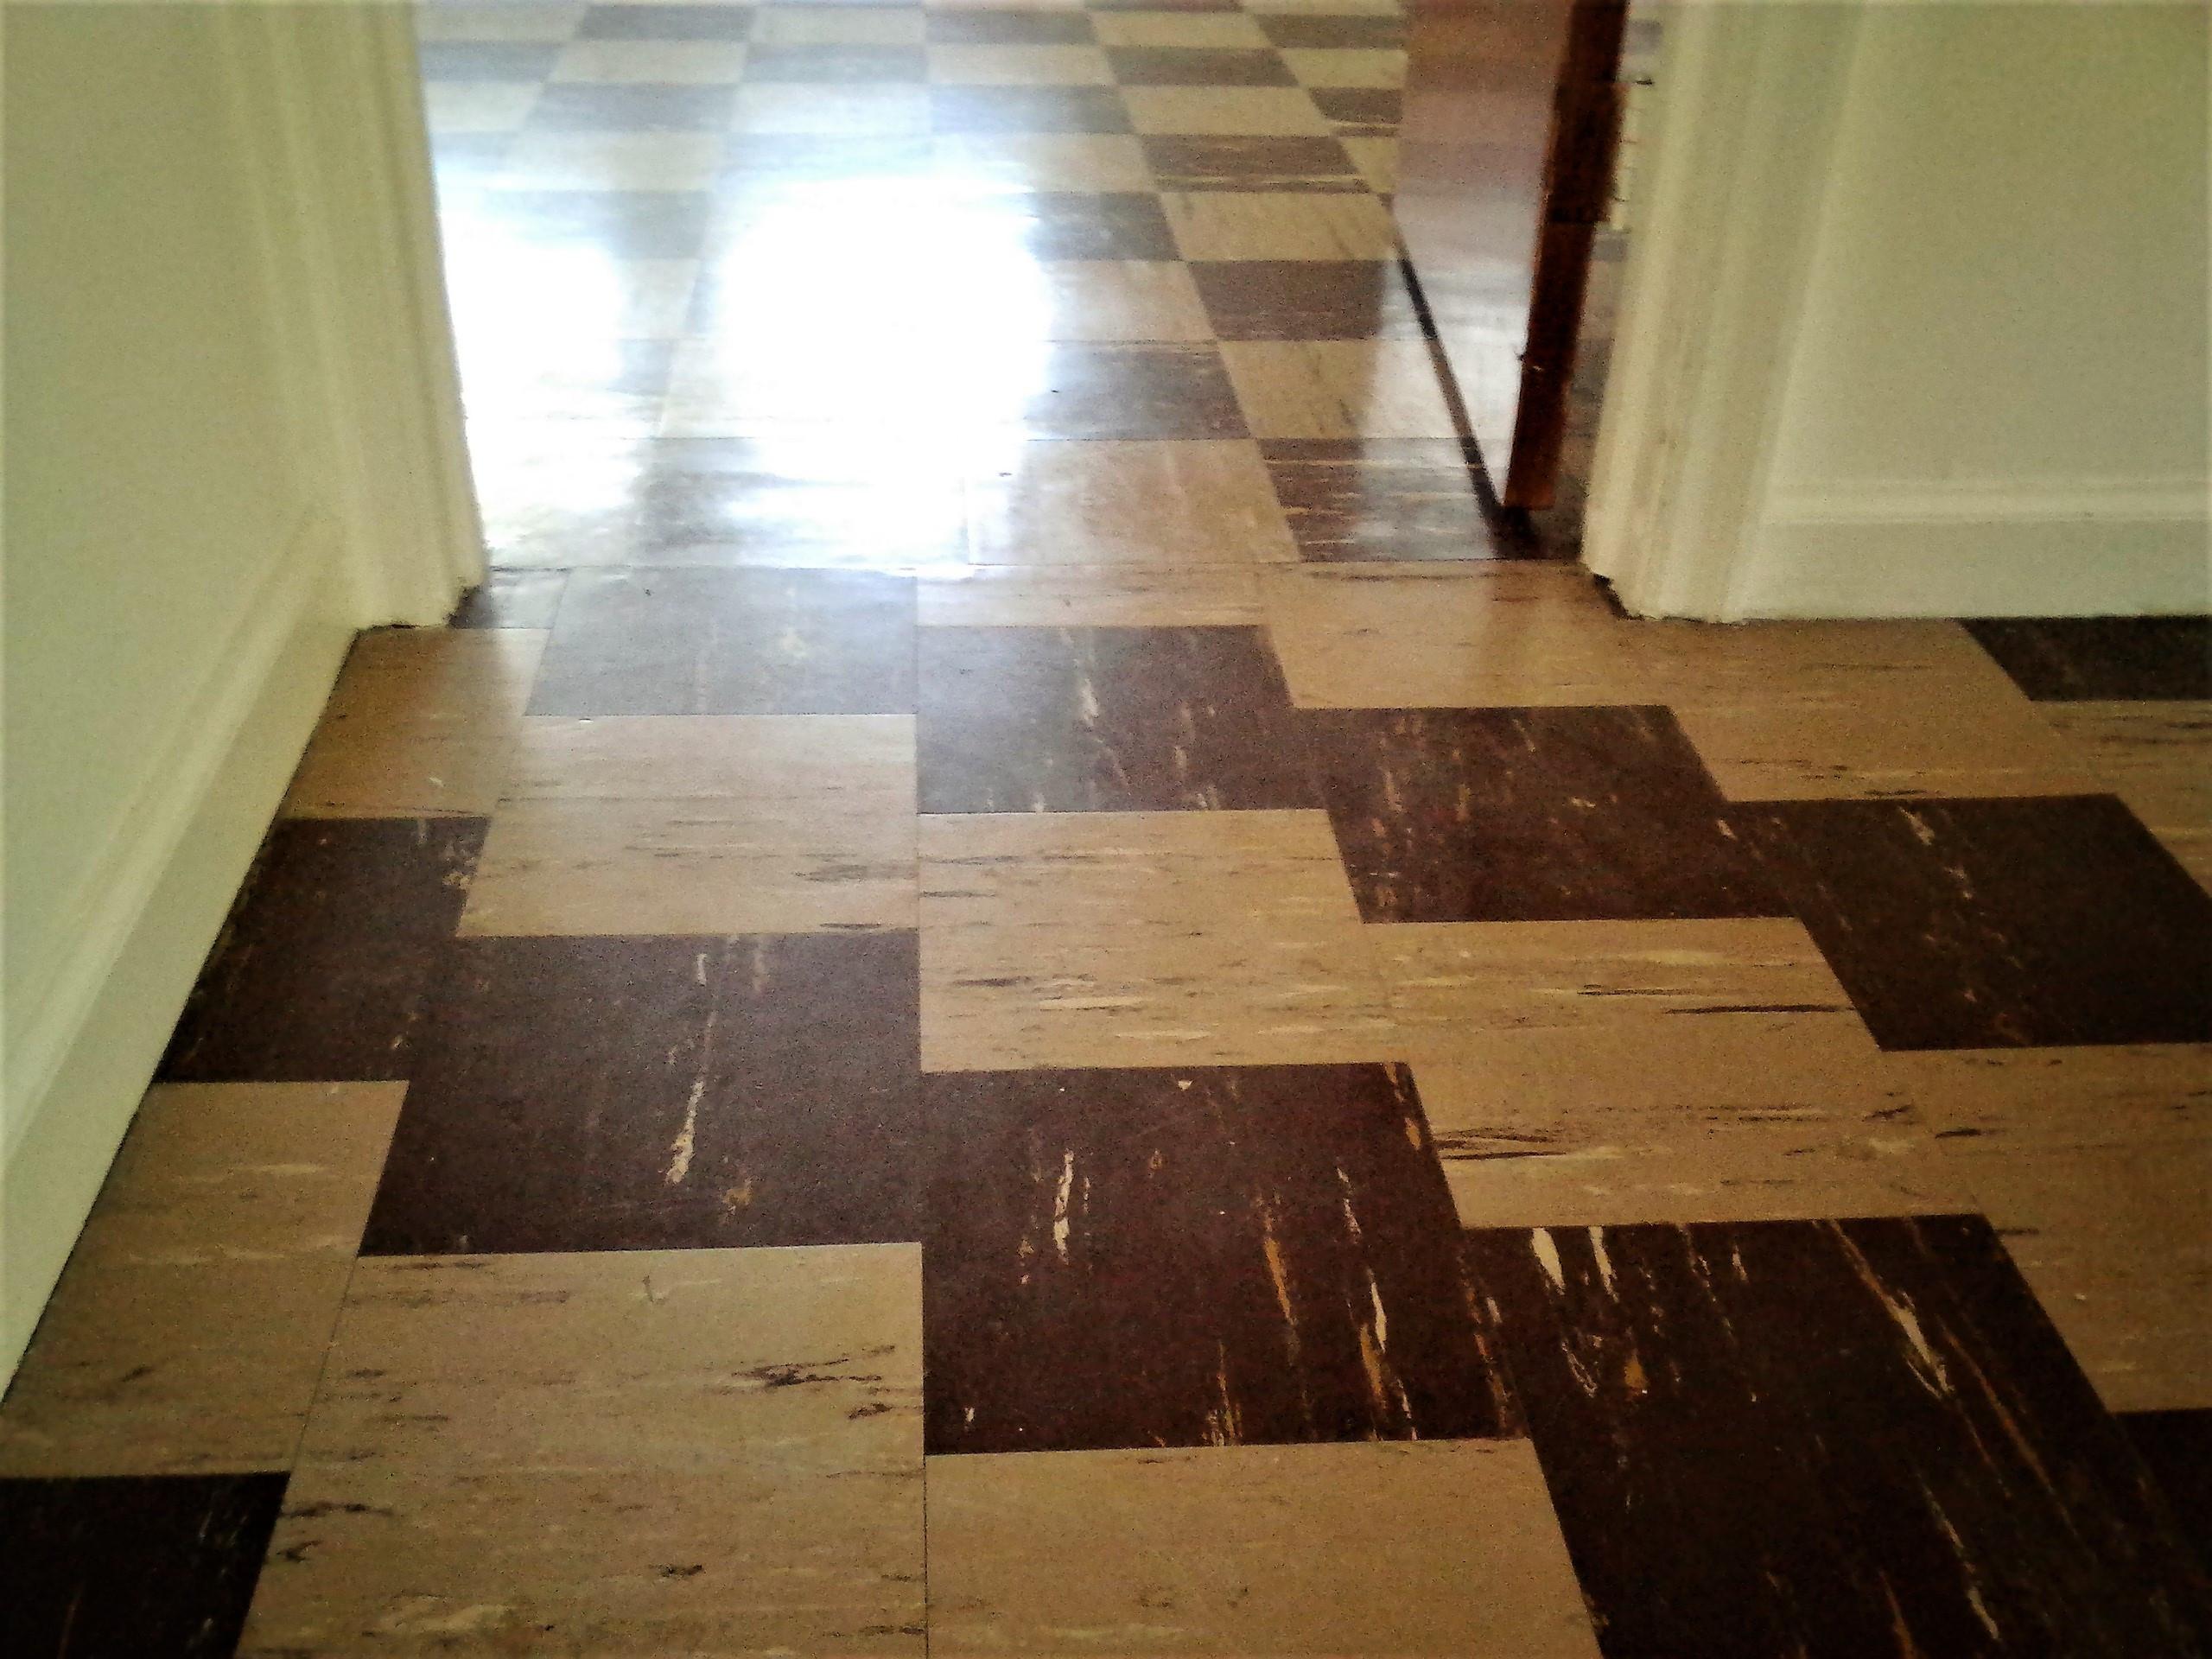 hardwood floor repair atlanta ga of asbestos flooring do you really need that abatement the flooring blog for old vinyl asbestos tile flooring